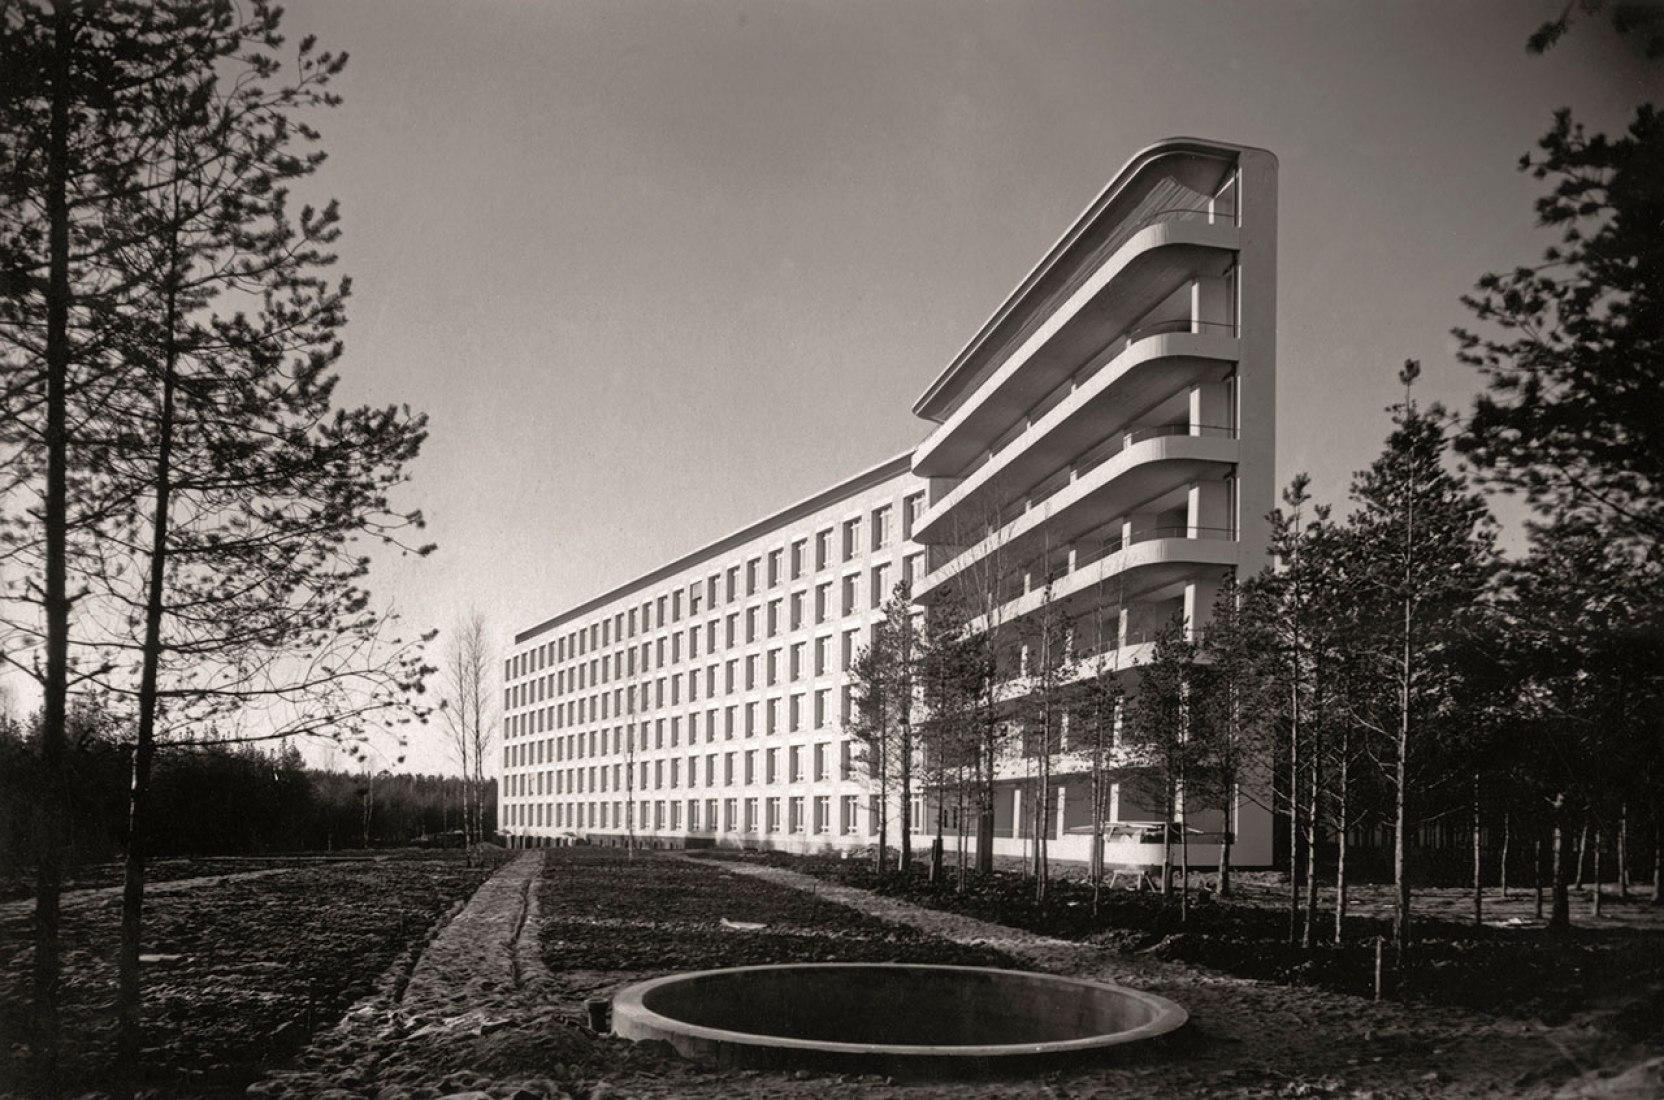 Sanatorio de Paimio para  tuberculosos, Finlandia, Alvar Aalto, 1928-1933 © Alvar Aalto Museum, VEGAP, Barcelona, 2015.